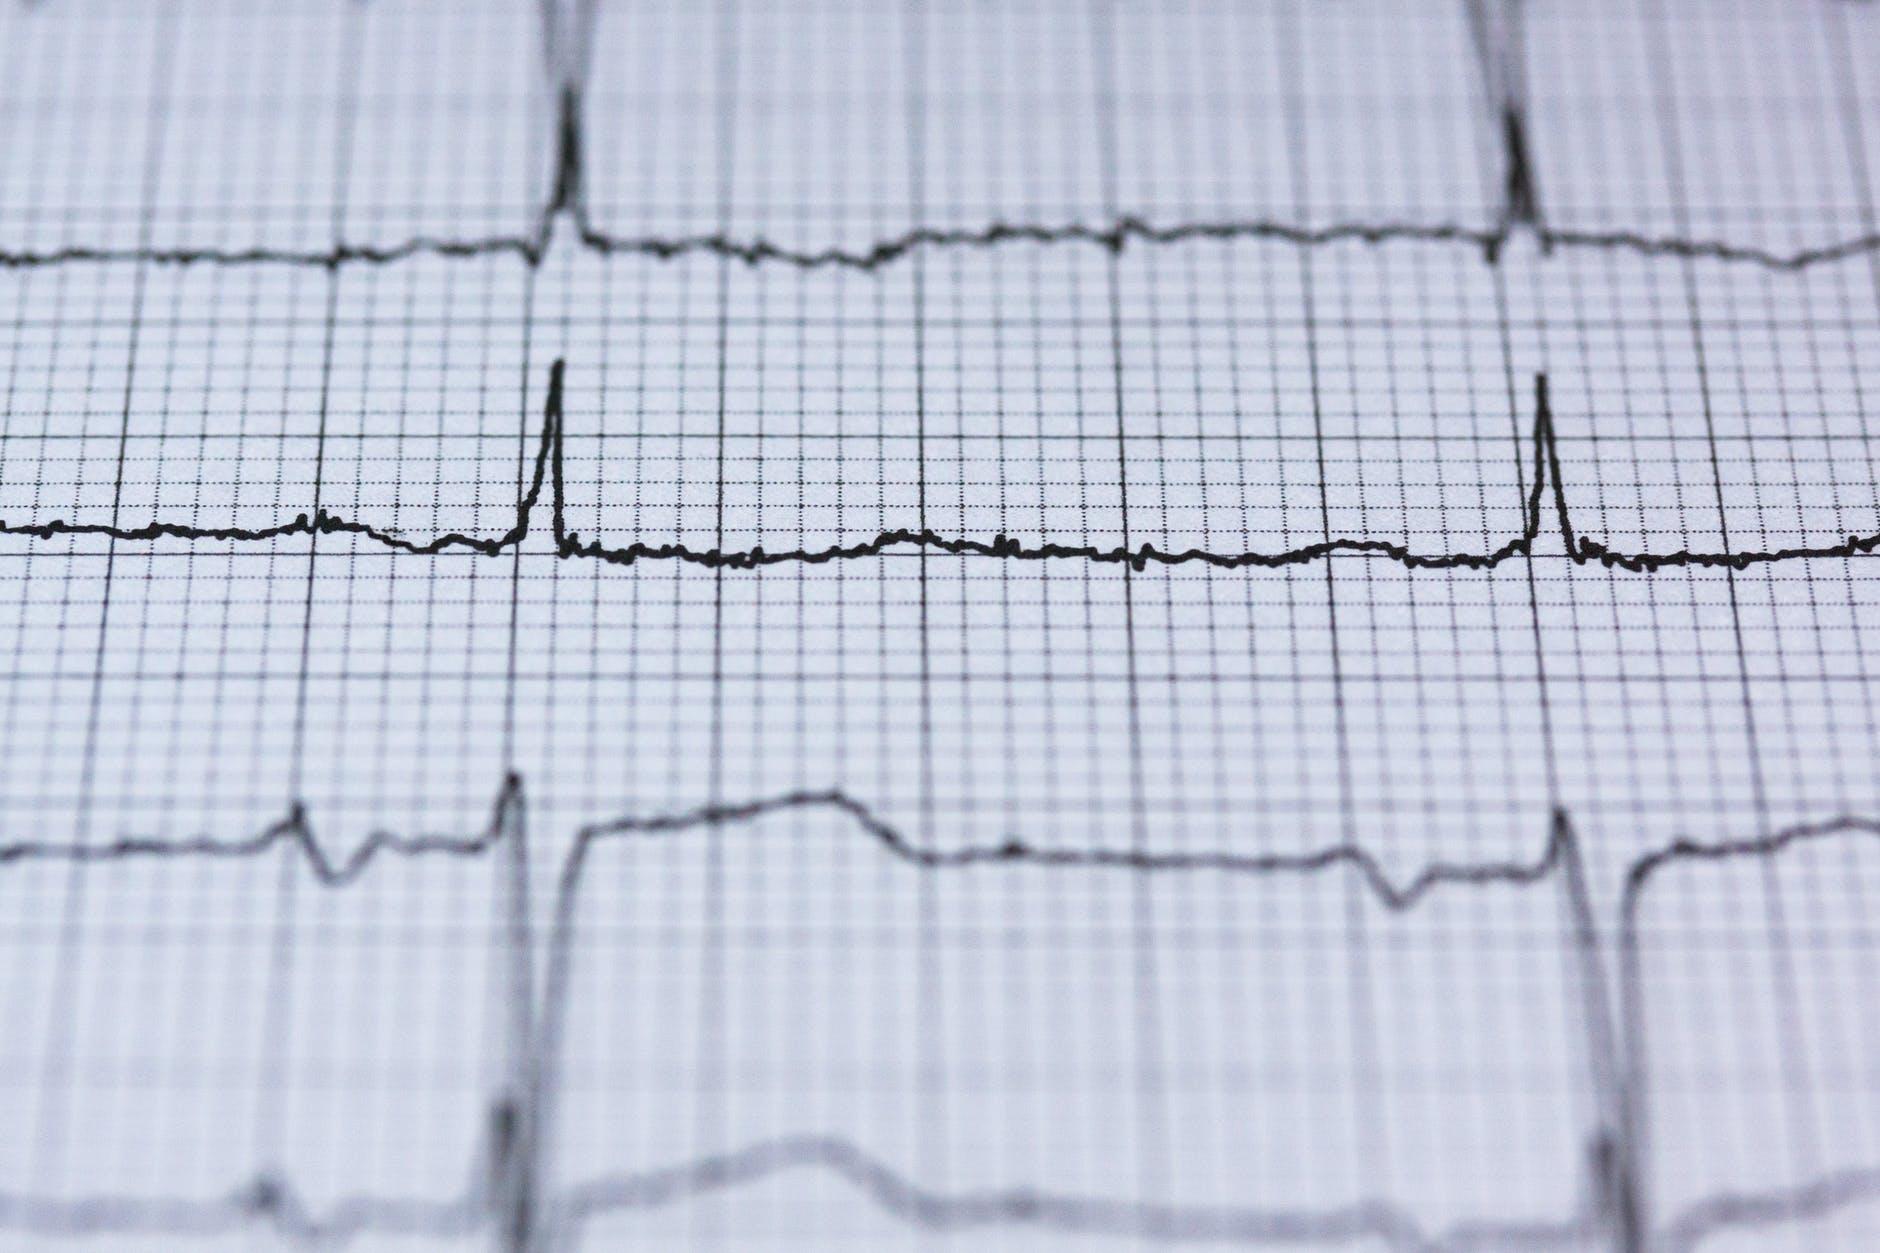 4 major types of cardiovascular diseases 1